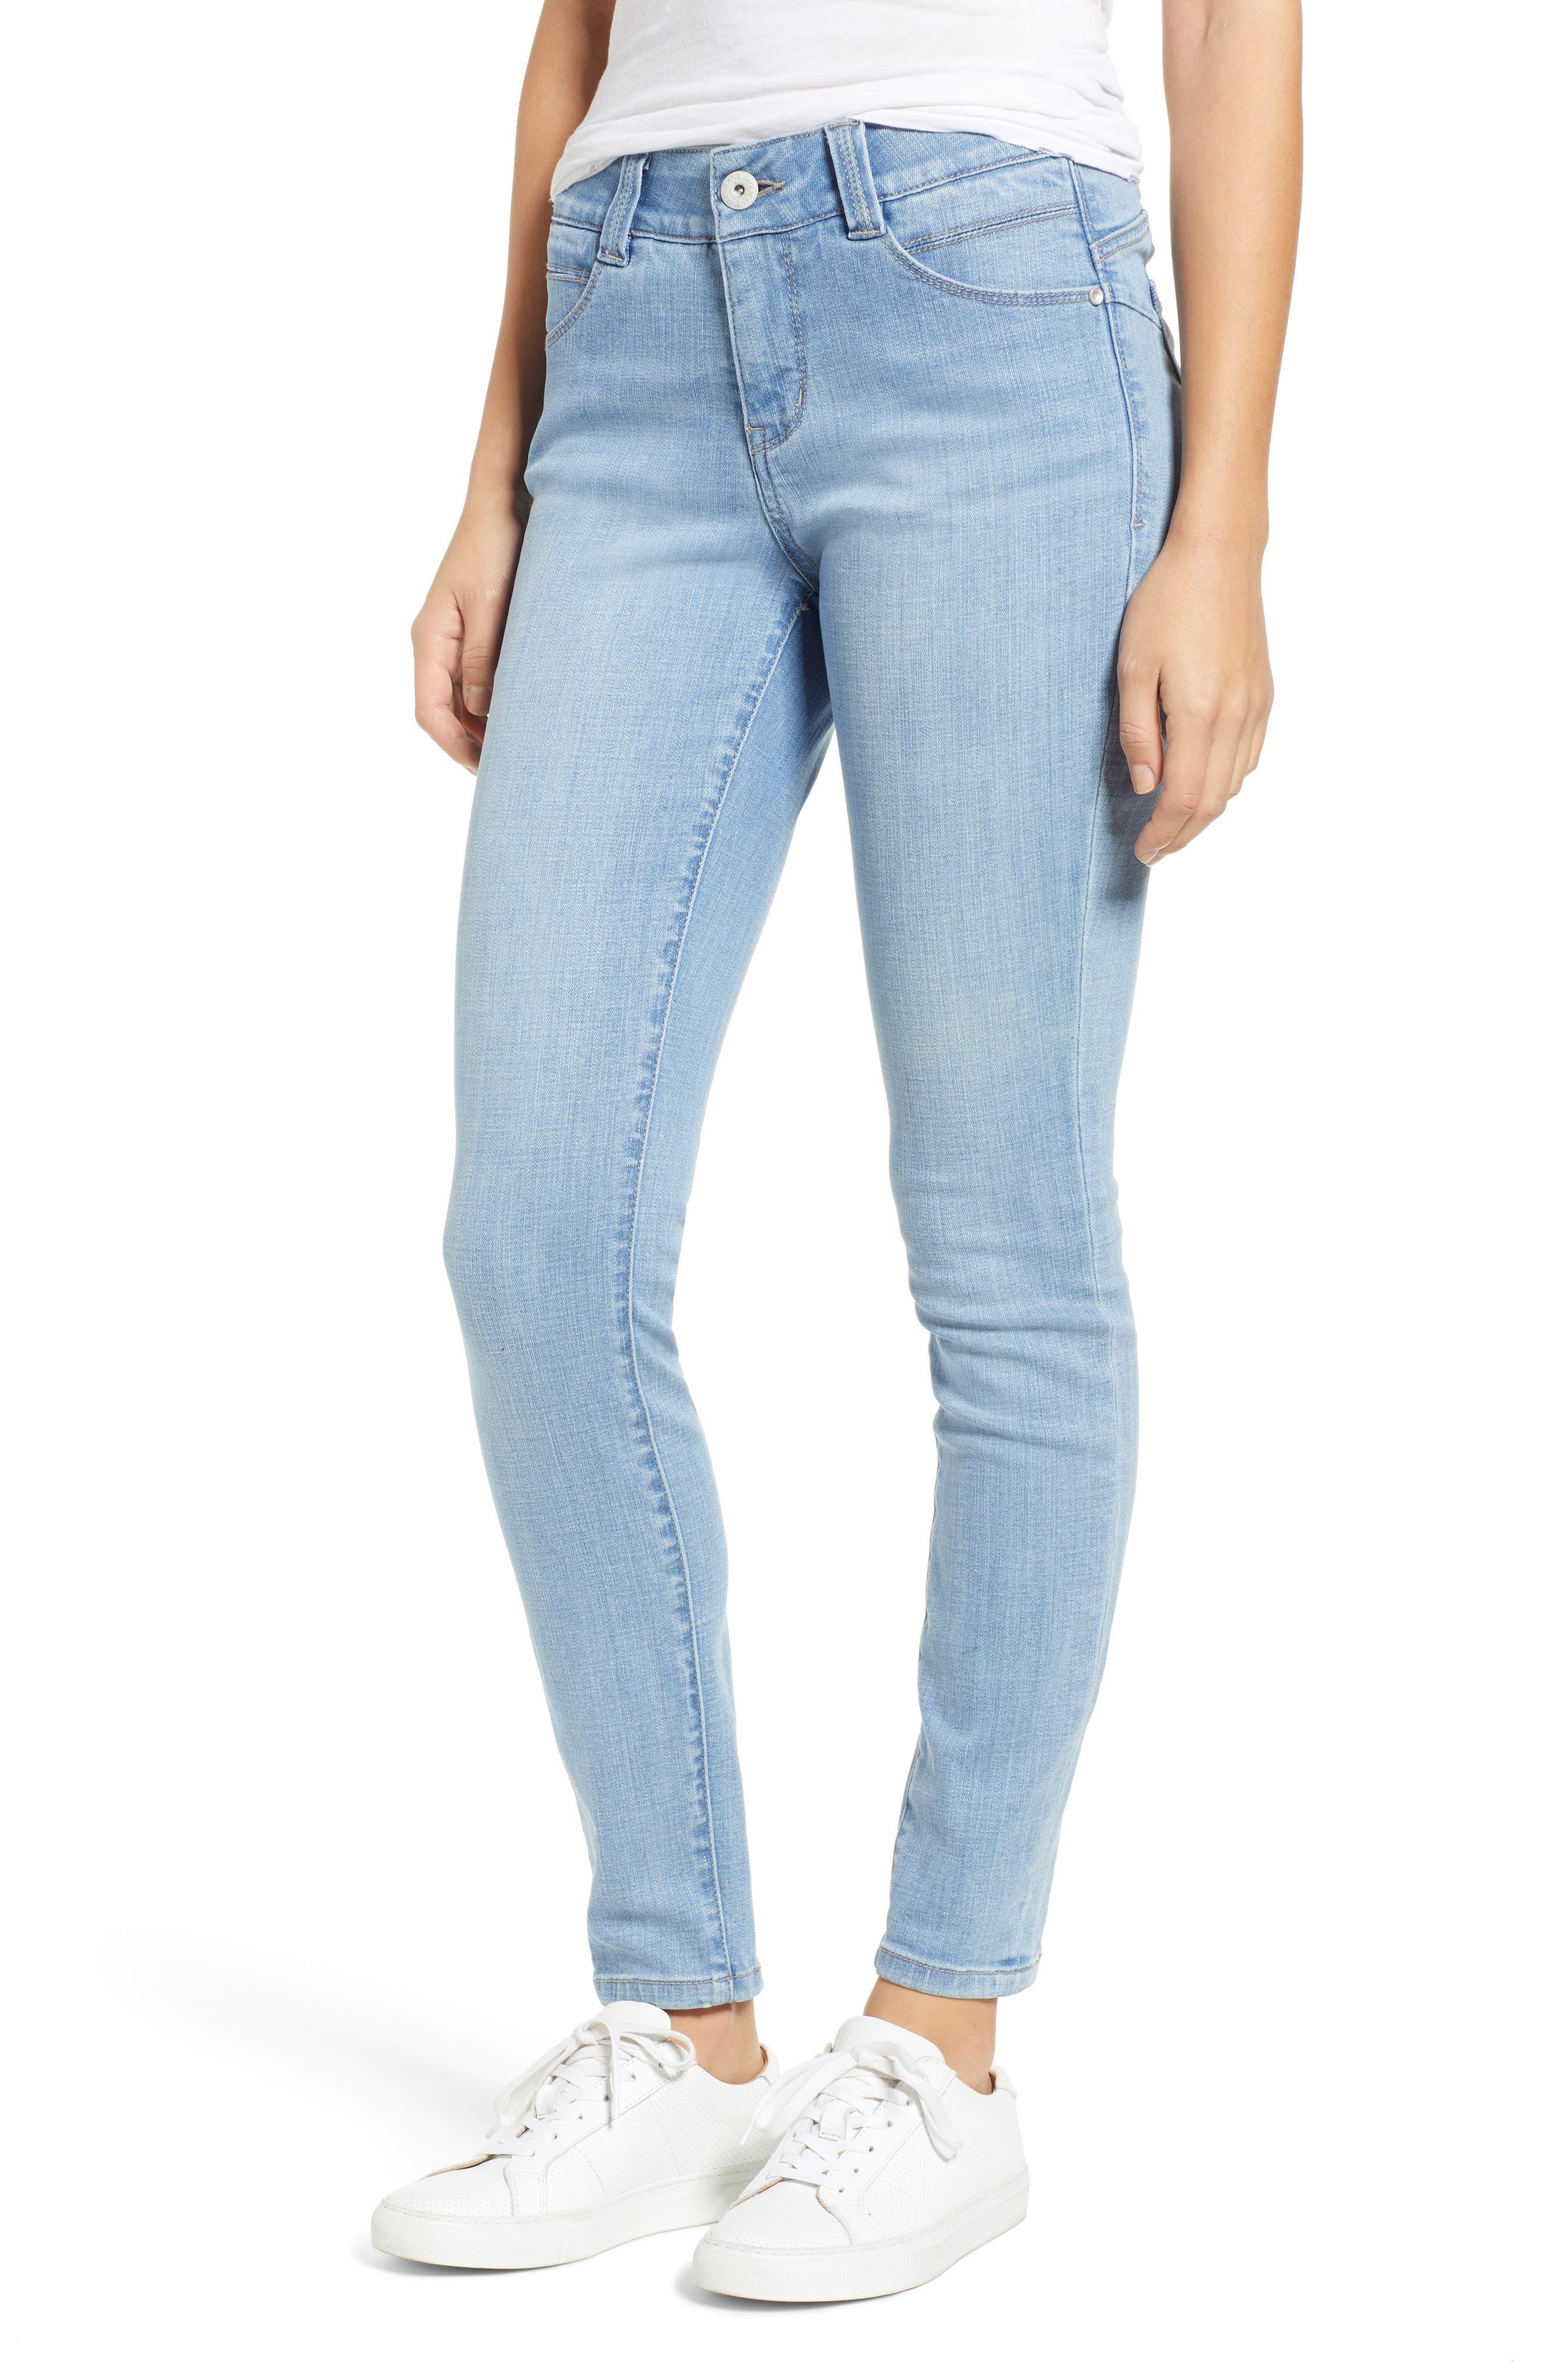 Cecilia Skinny Jeans in Island Blue